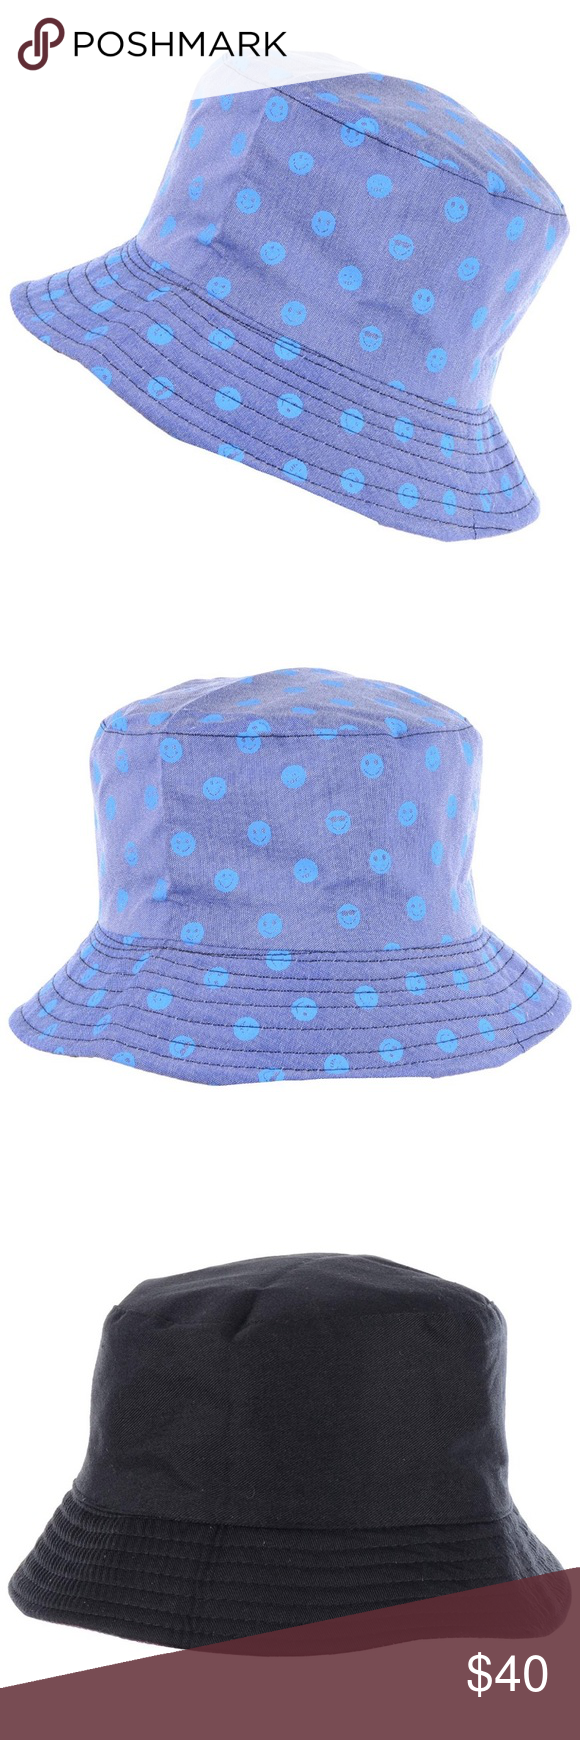 Blue Men S Emoji Face Pattern Bucket Hat Nwt Blue Man Emoji Faces Summer Hats